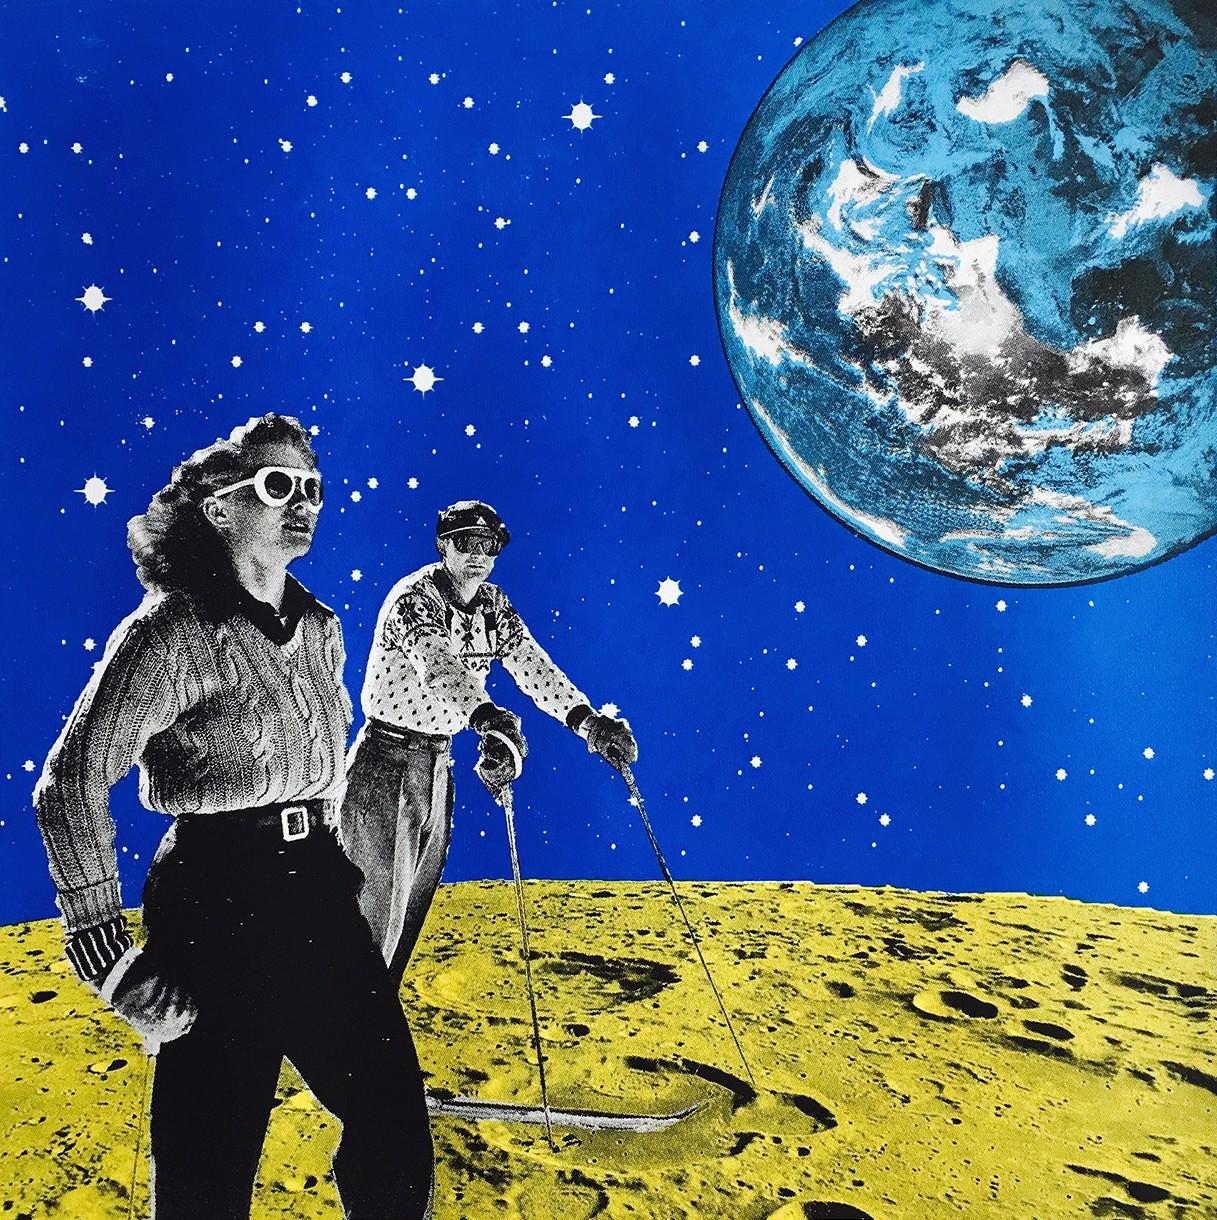 Space Hiking by Anne Storno, Contemporarti